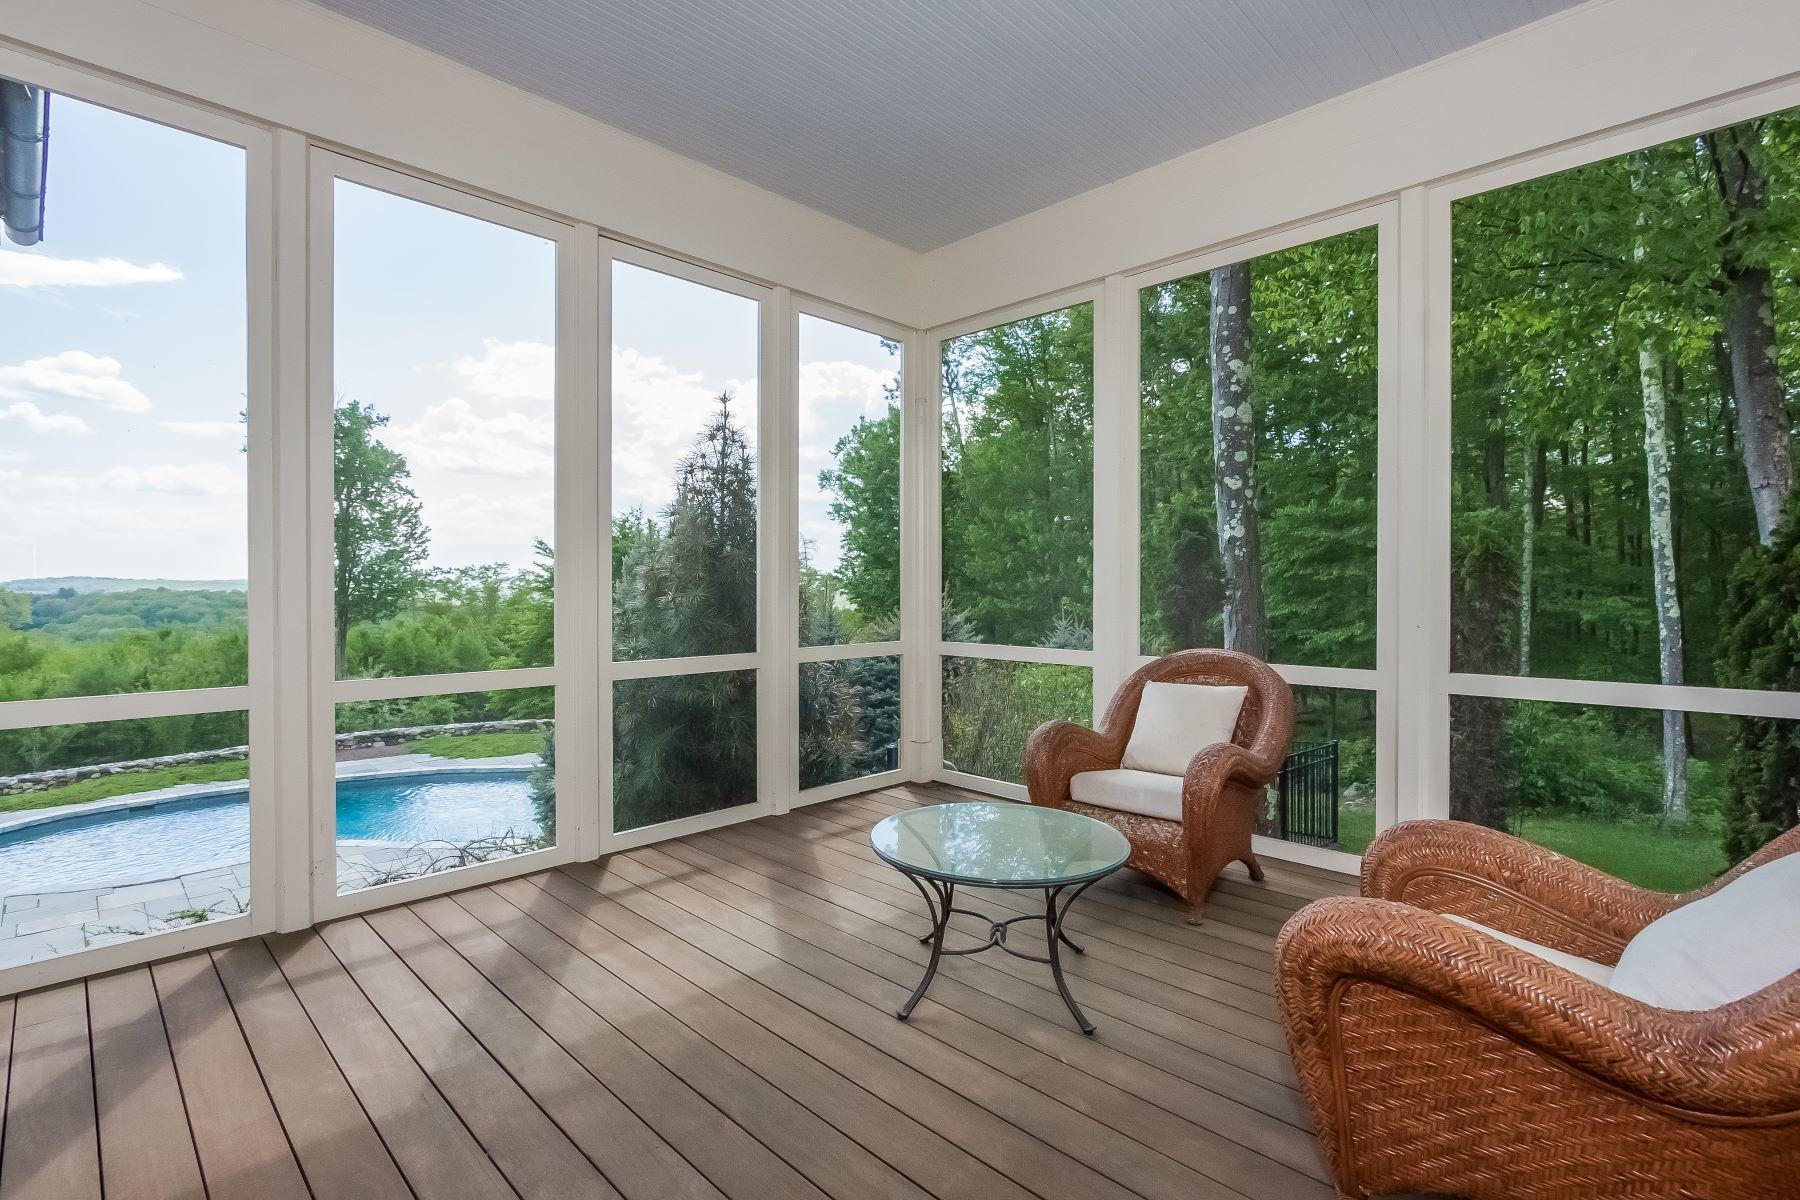 Additional photo for property listing at Bella Vista 24 Ranney Hill Road Roxbury, Connecticut 06783 États-Unis